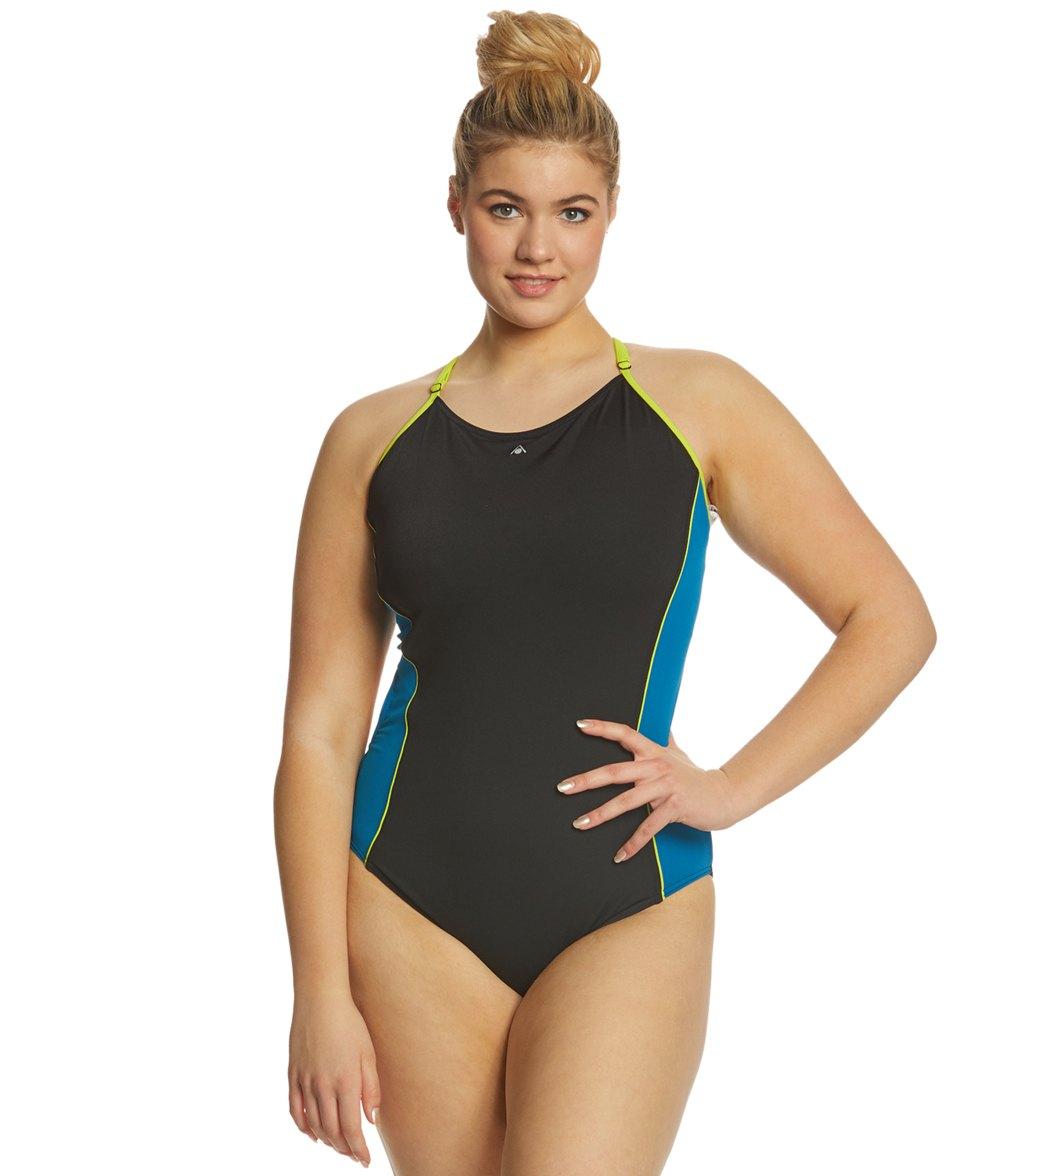 7c7671f9794 Women s Plus Size Nastia One Piece Swimsuit Play Video. MODEL MEASUREMENTS